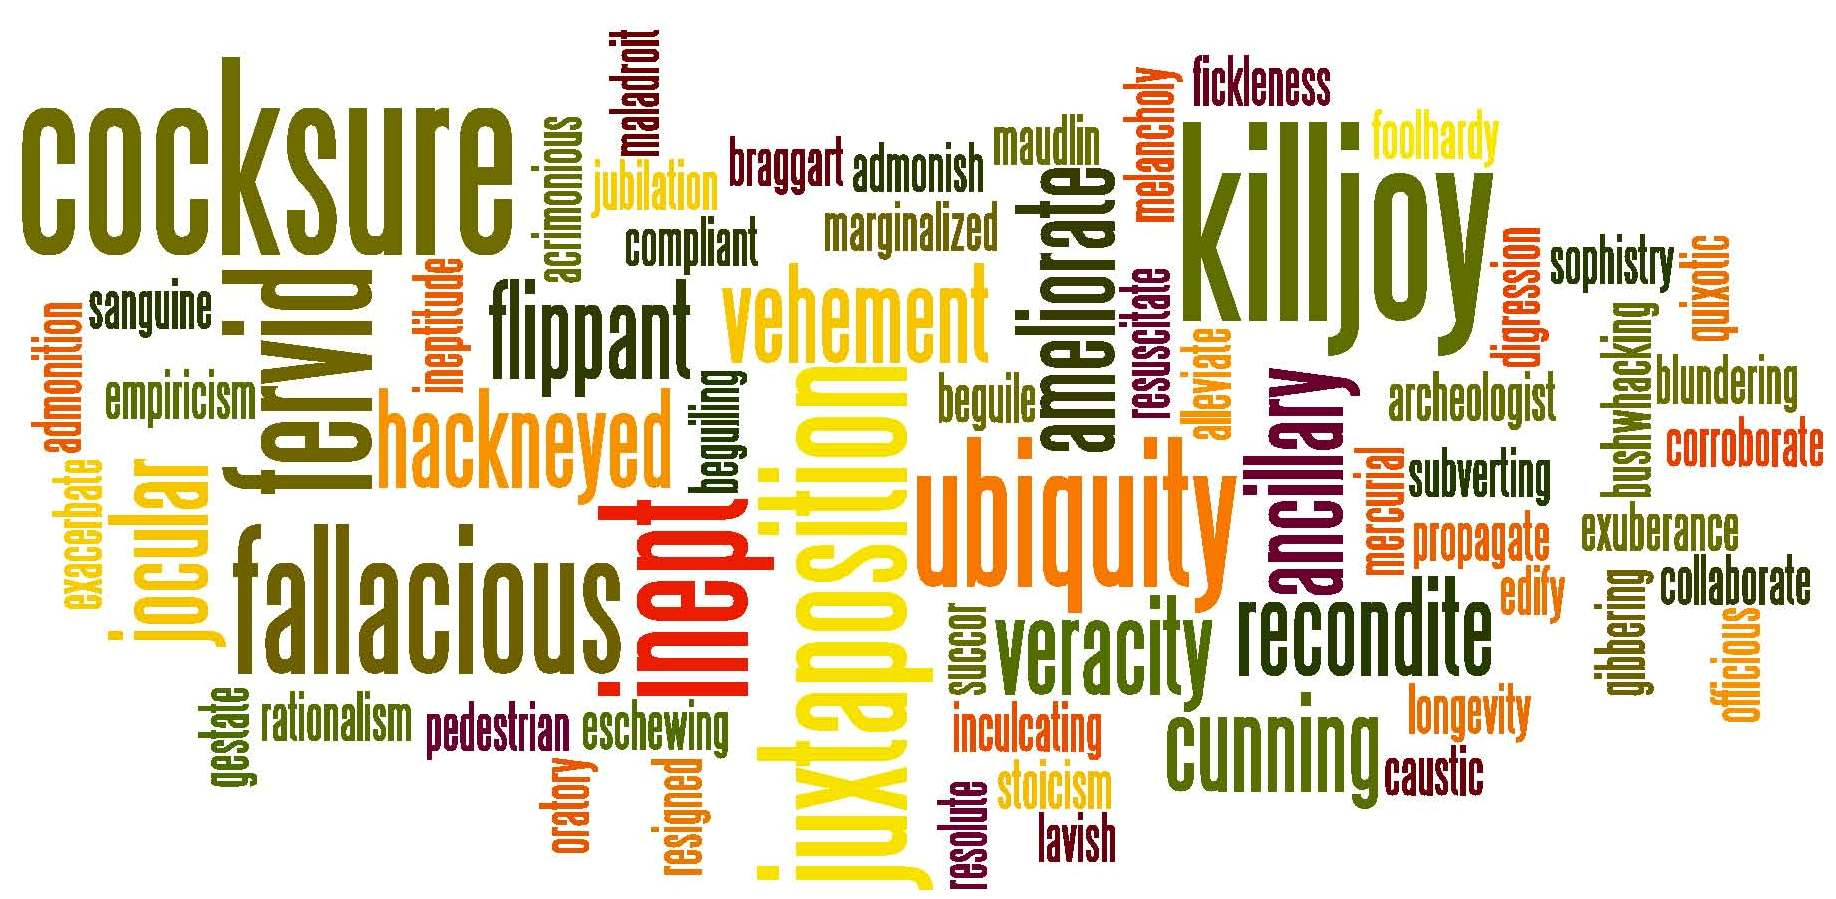 Utilitarianism vs deontology essay